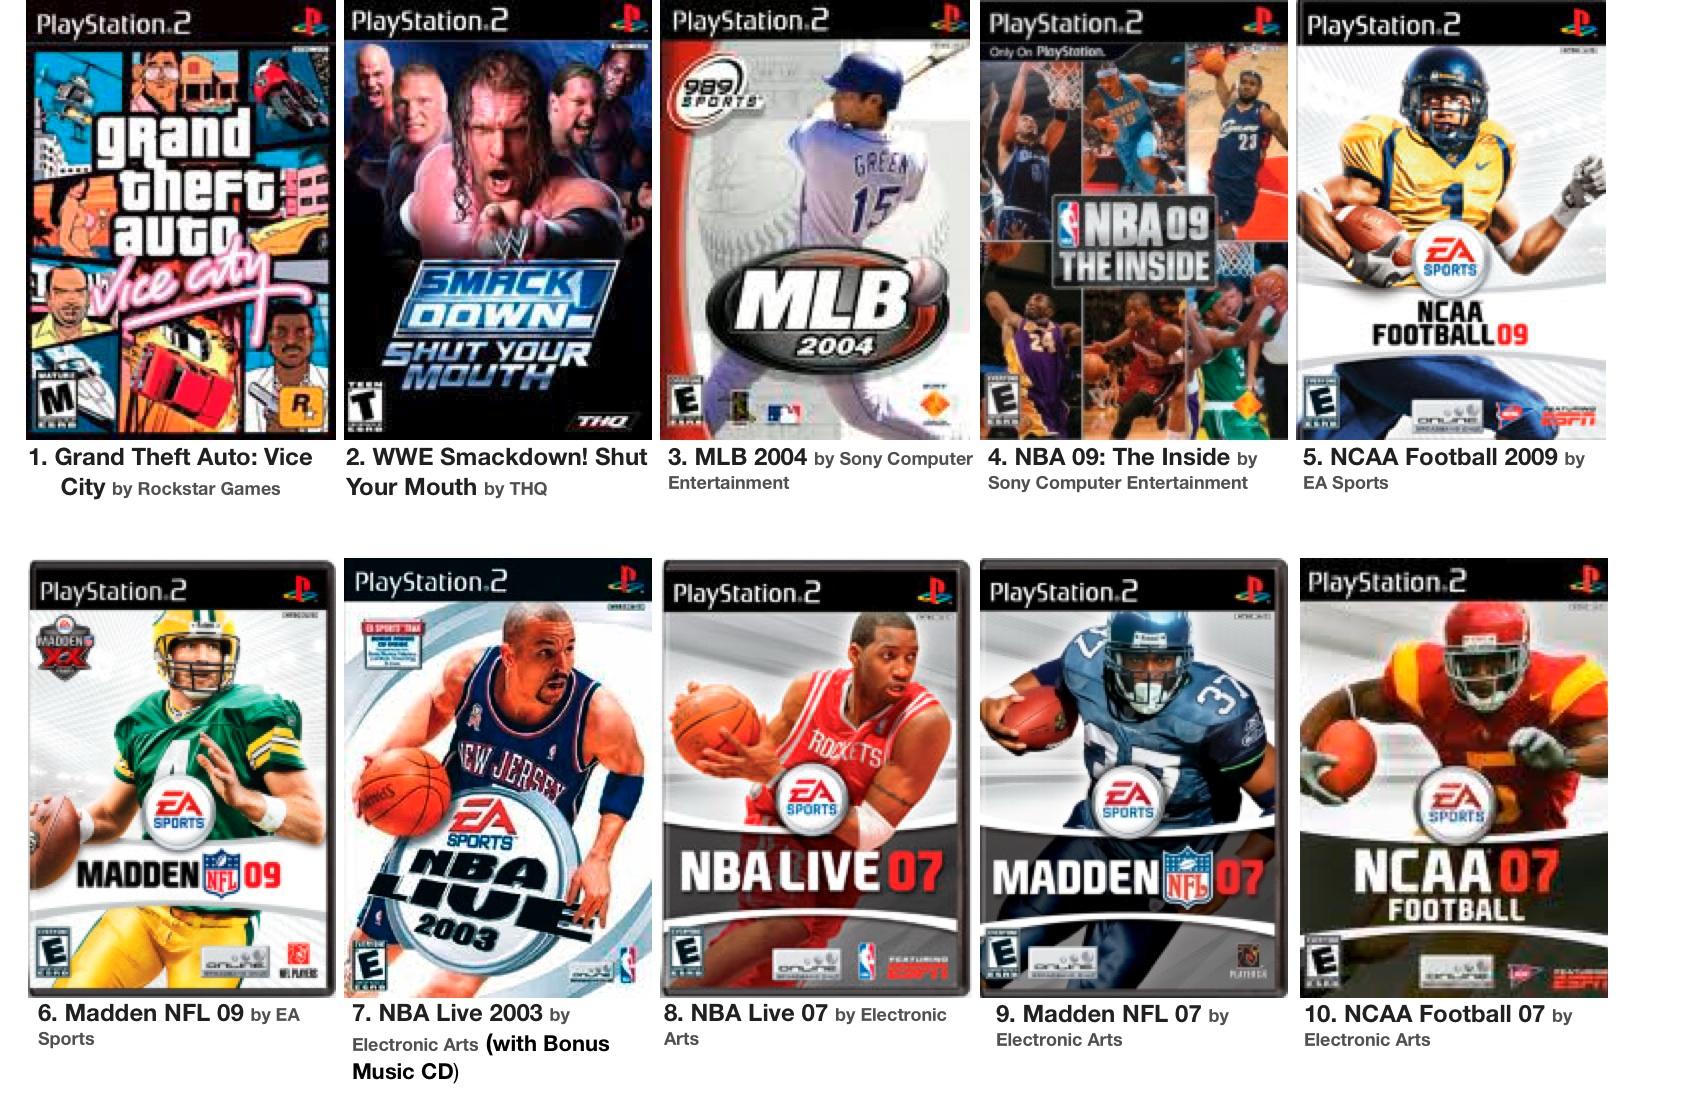 Playstation 2 Games List Playstation 2 g...